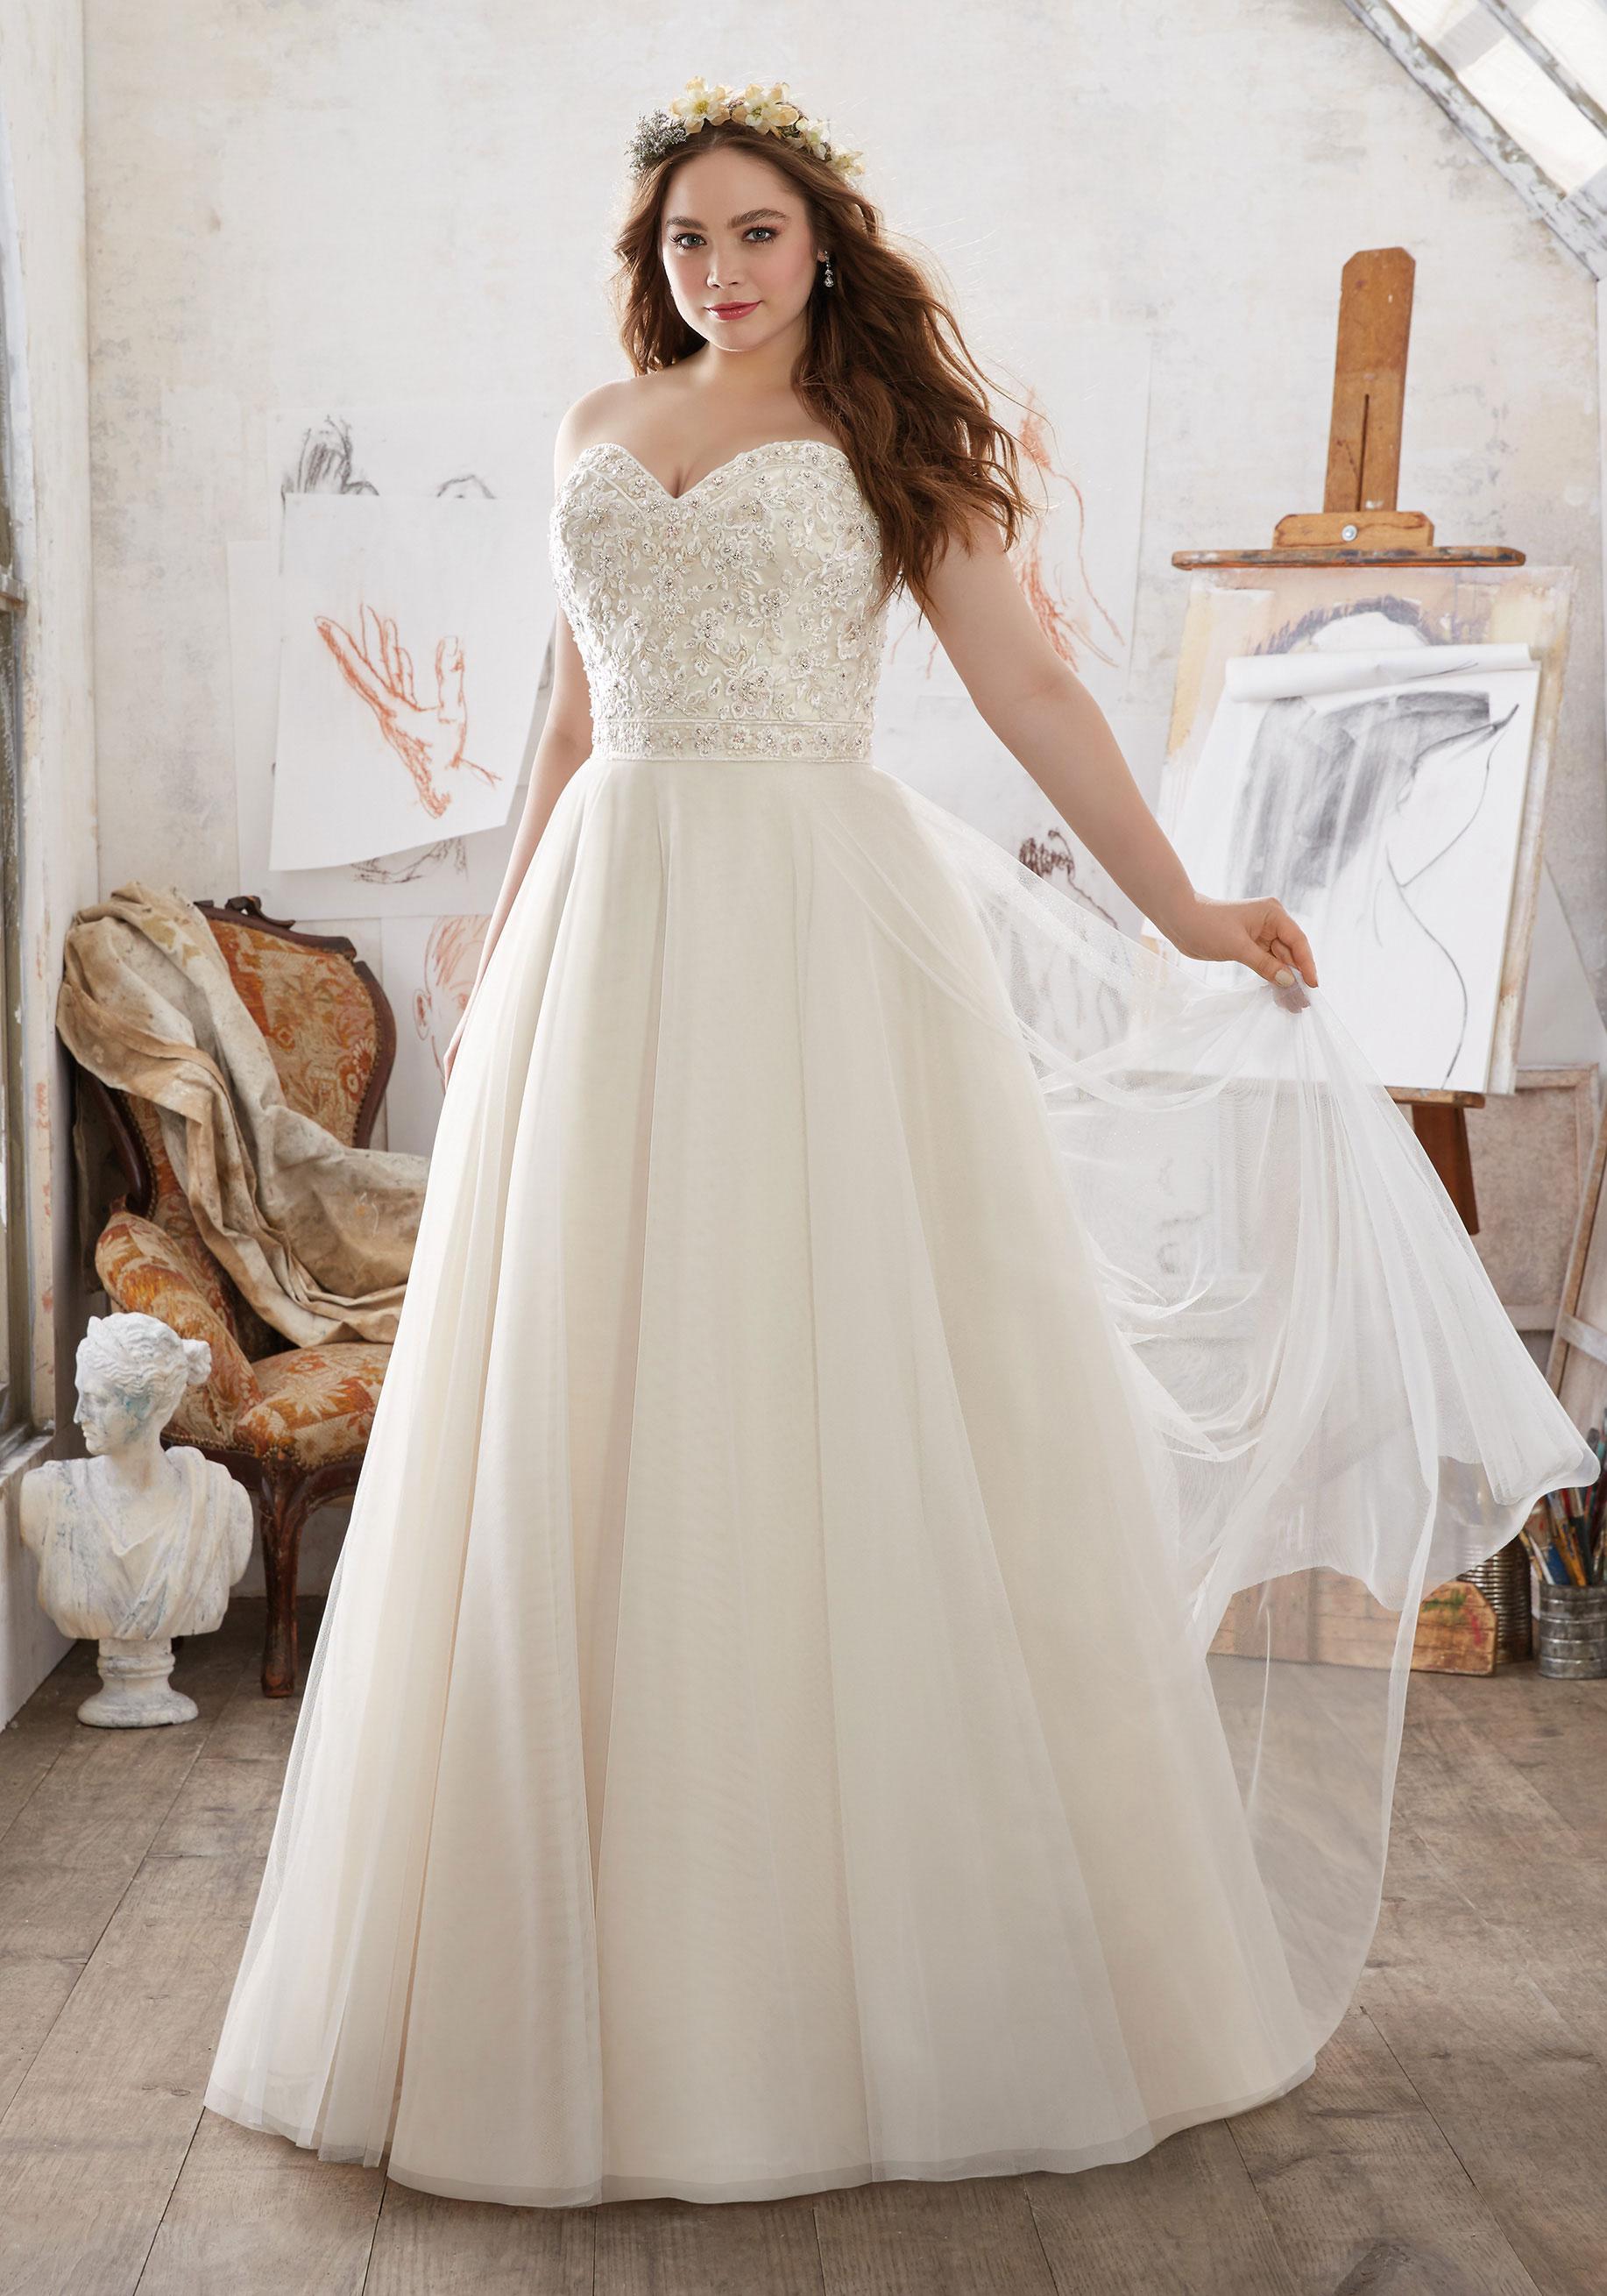 Used mori lee wedding dresses - SandiegoTowingca.com